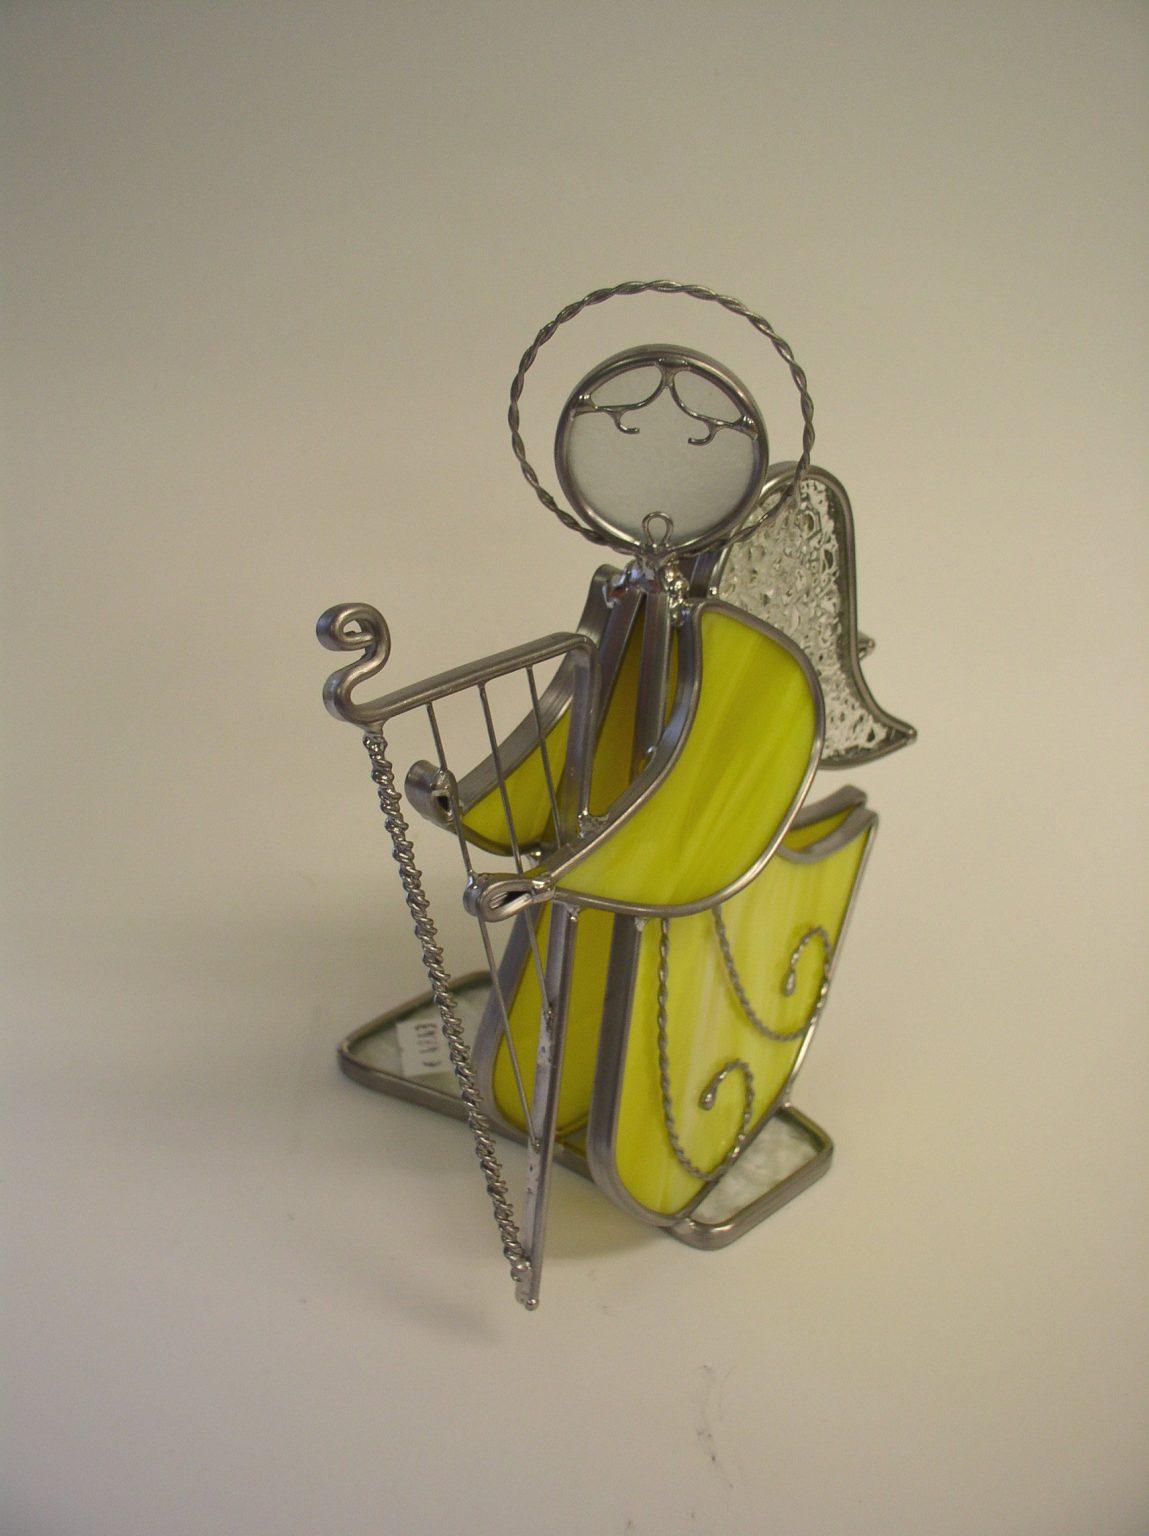 Decoratief glas-in-lood